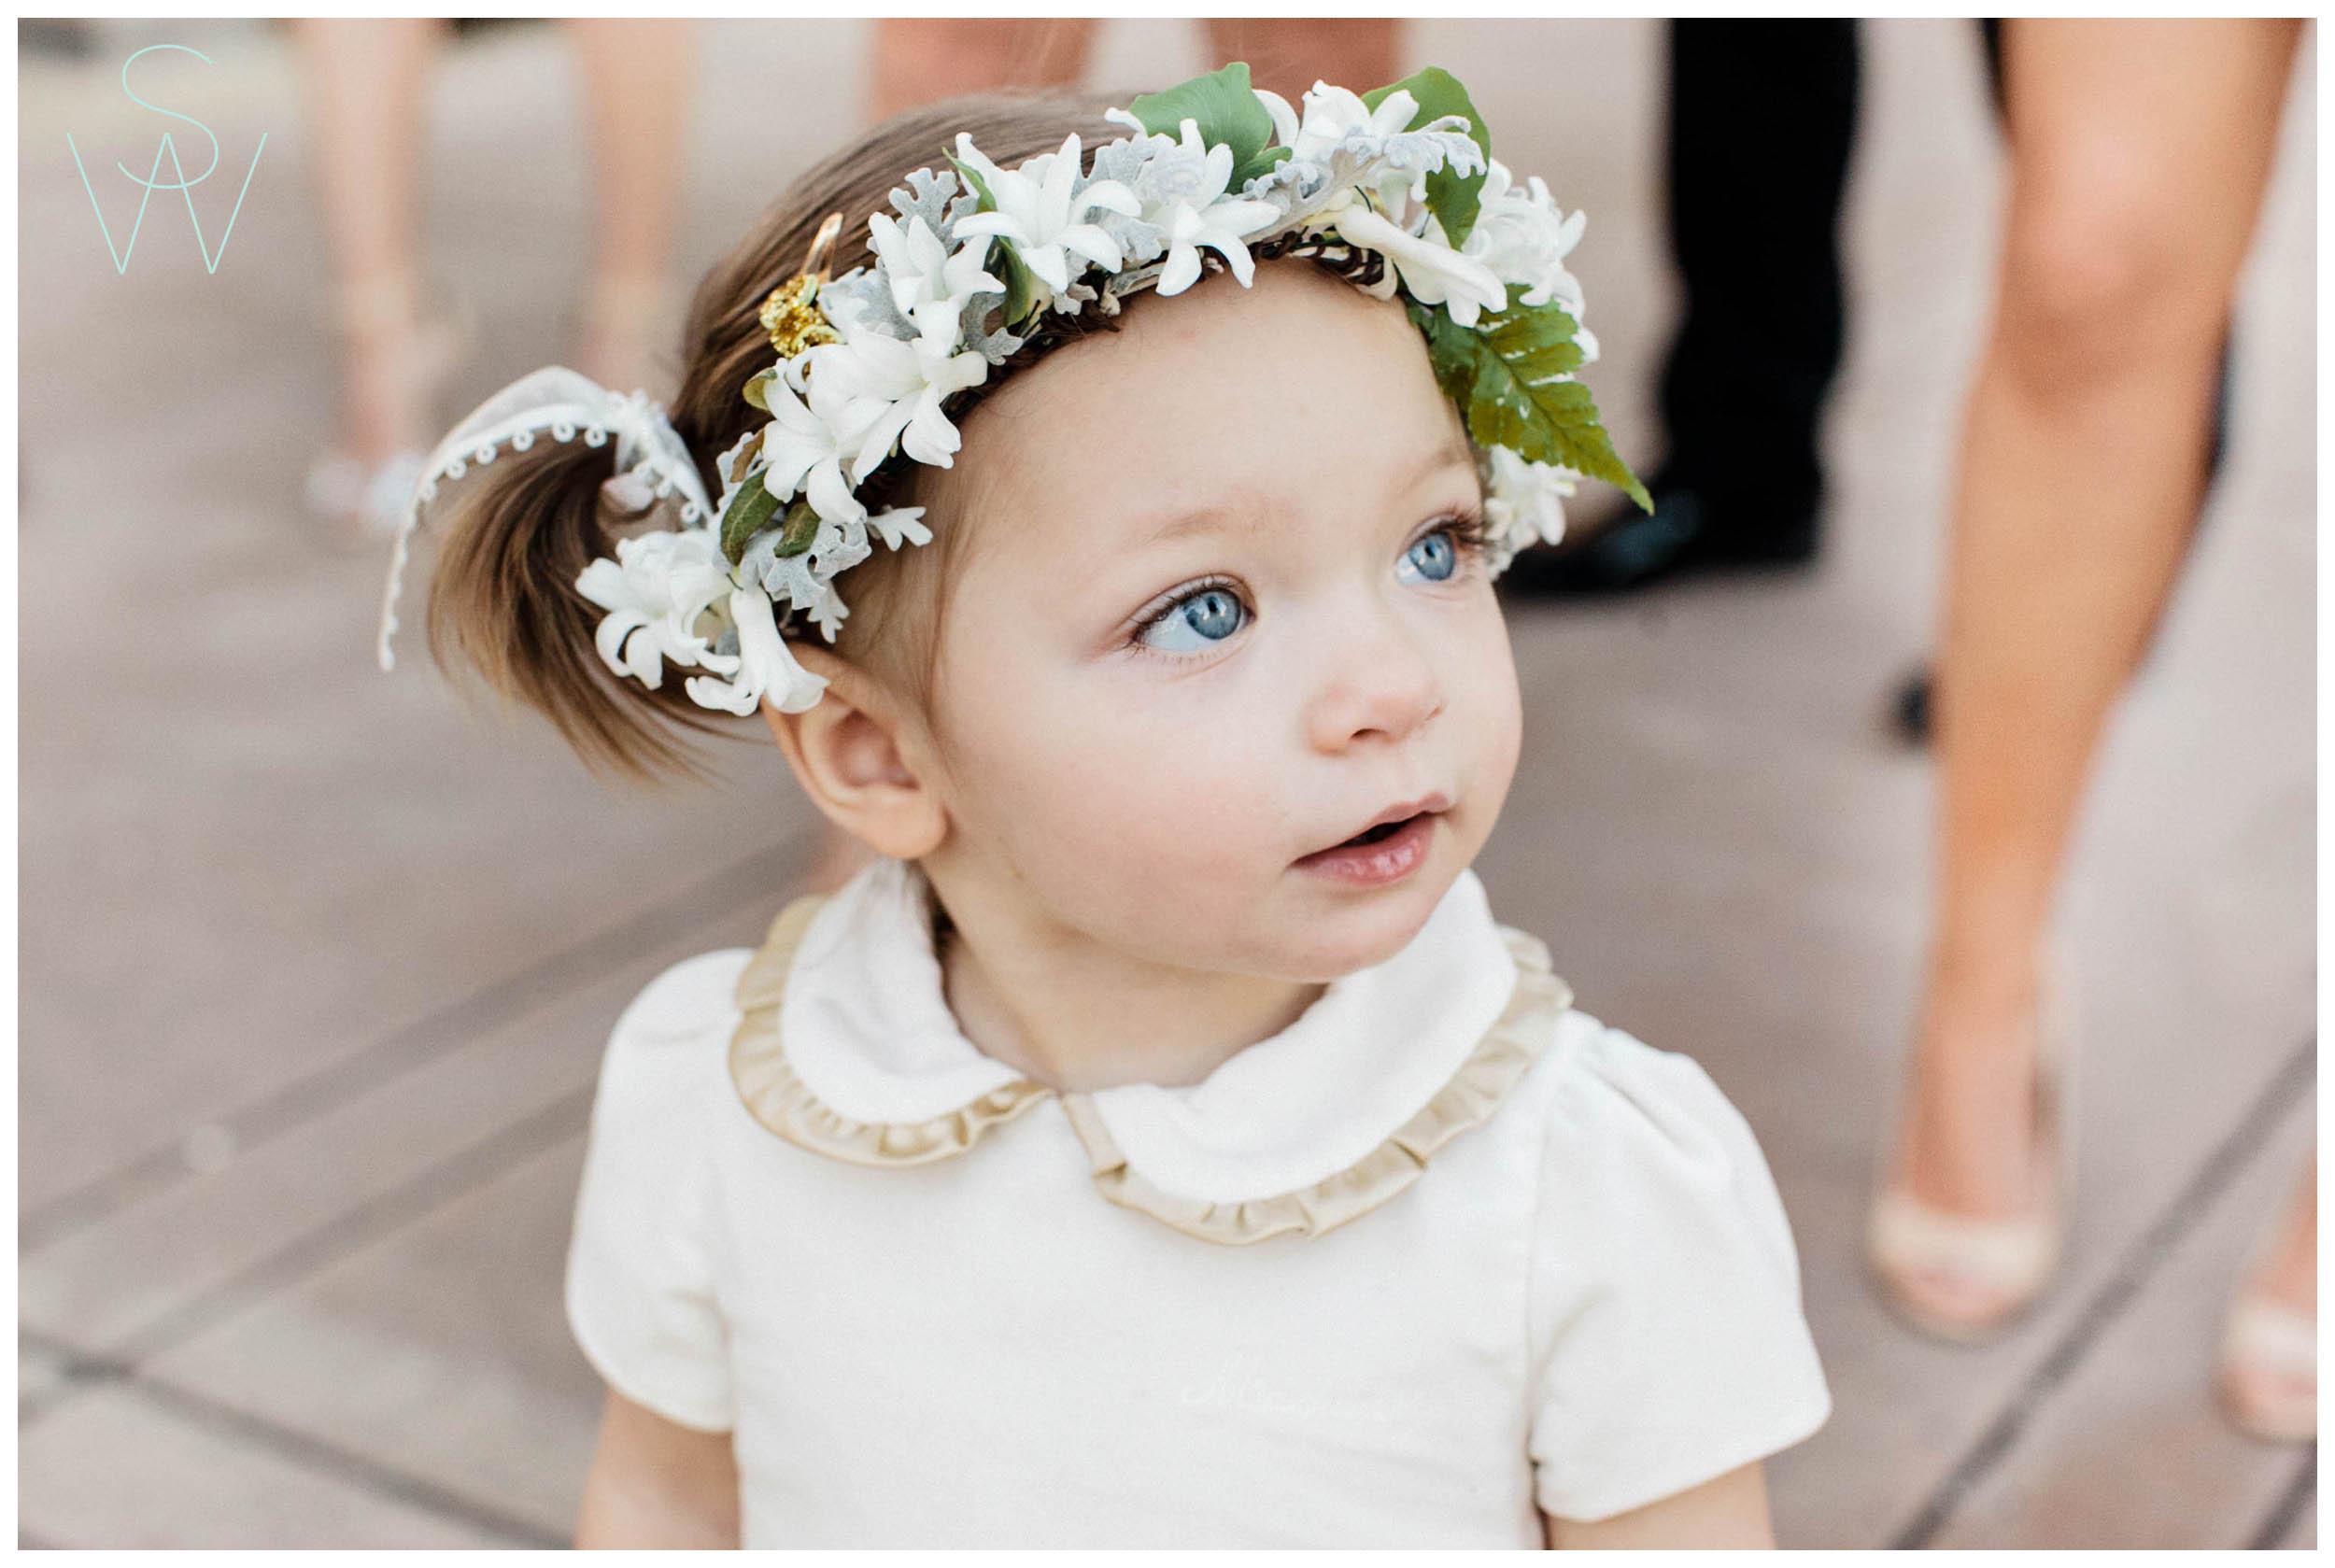 Shewanders.sdma_.wedding.photography-1030.jpg.wedding.photography-1030.jpg